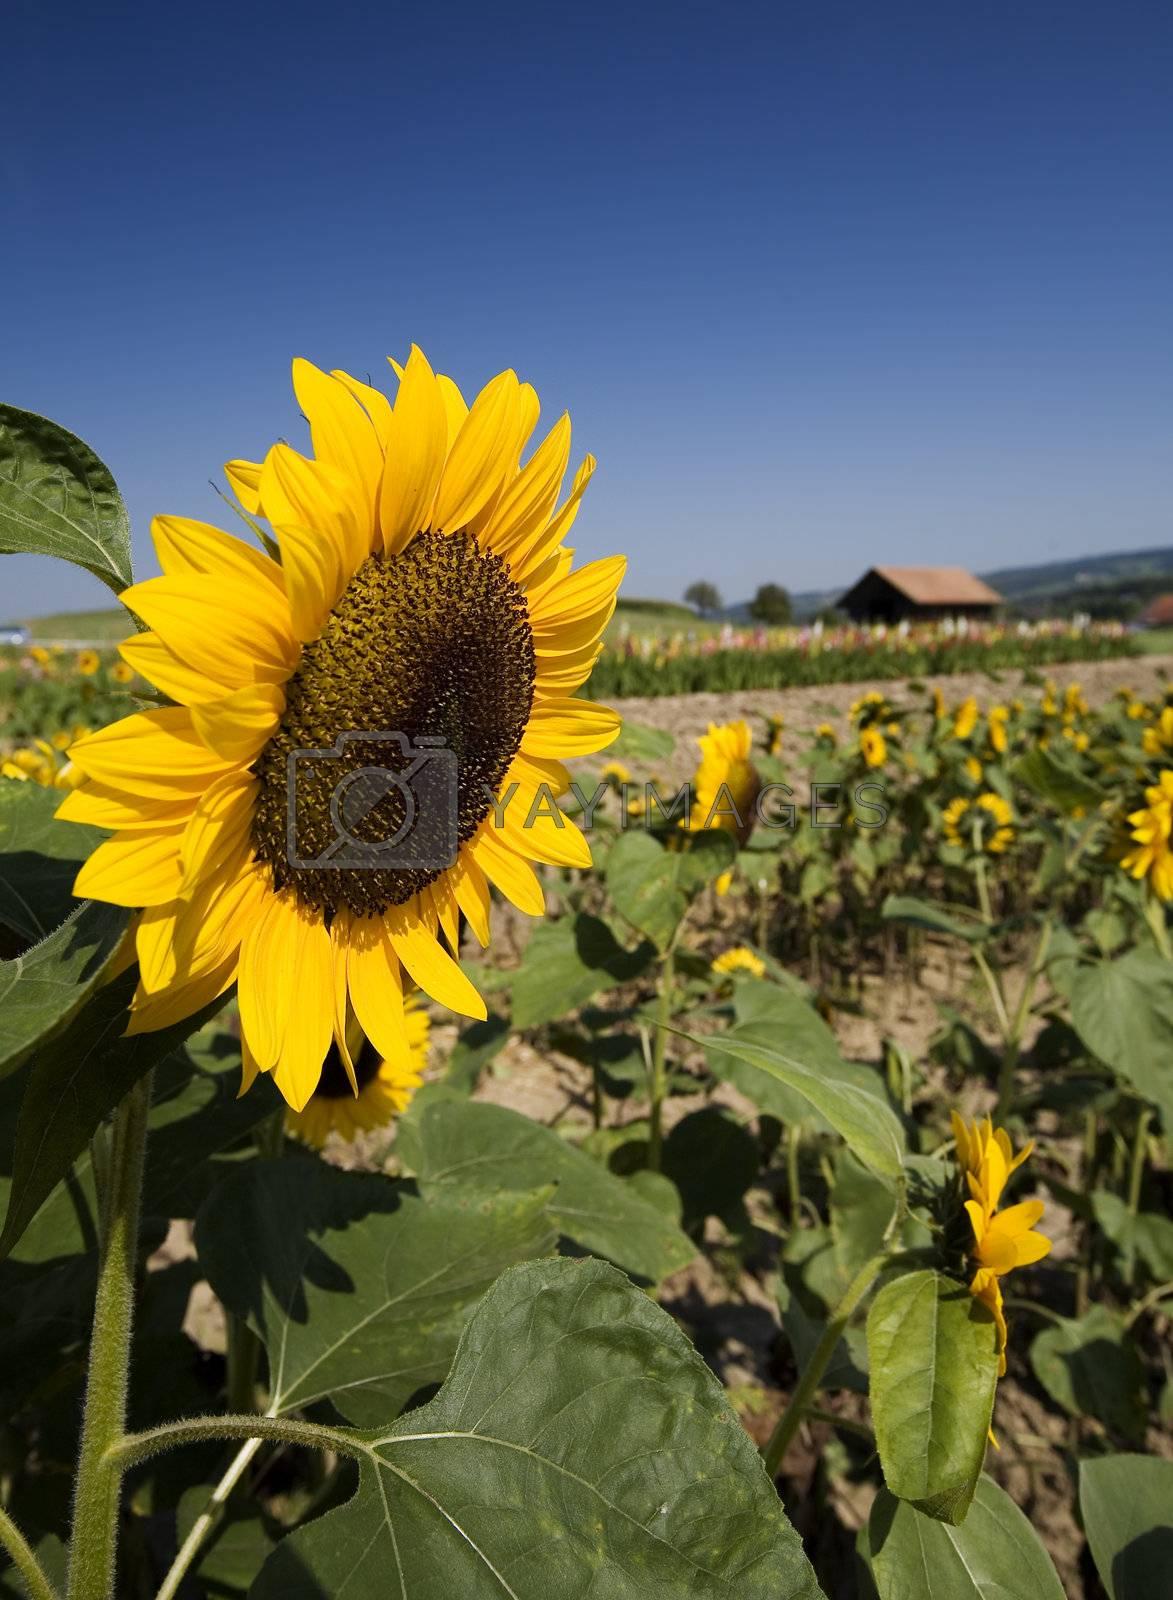 Summer field of sunflowers (France)